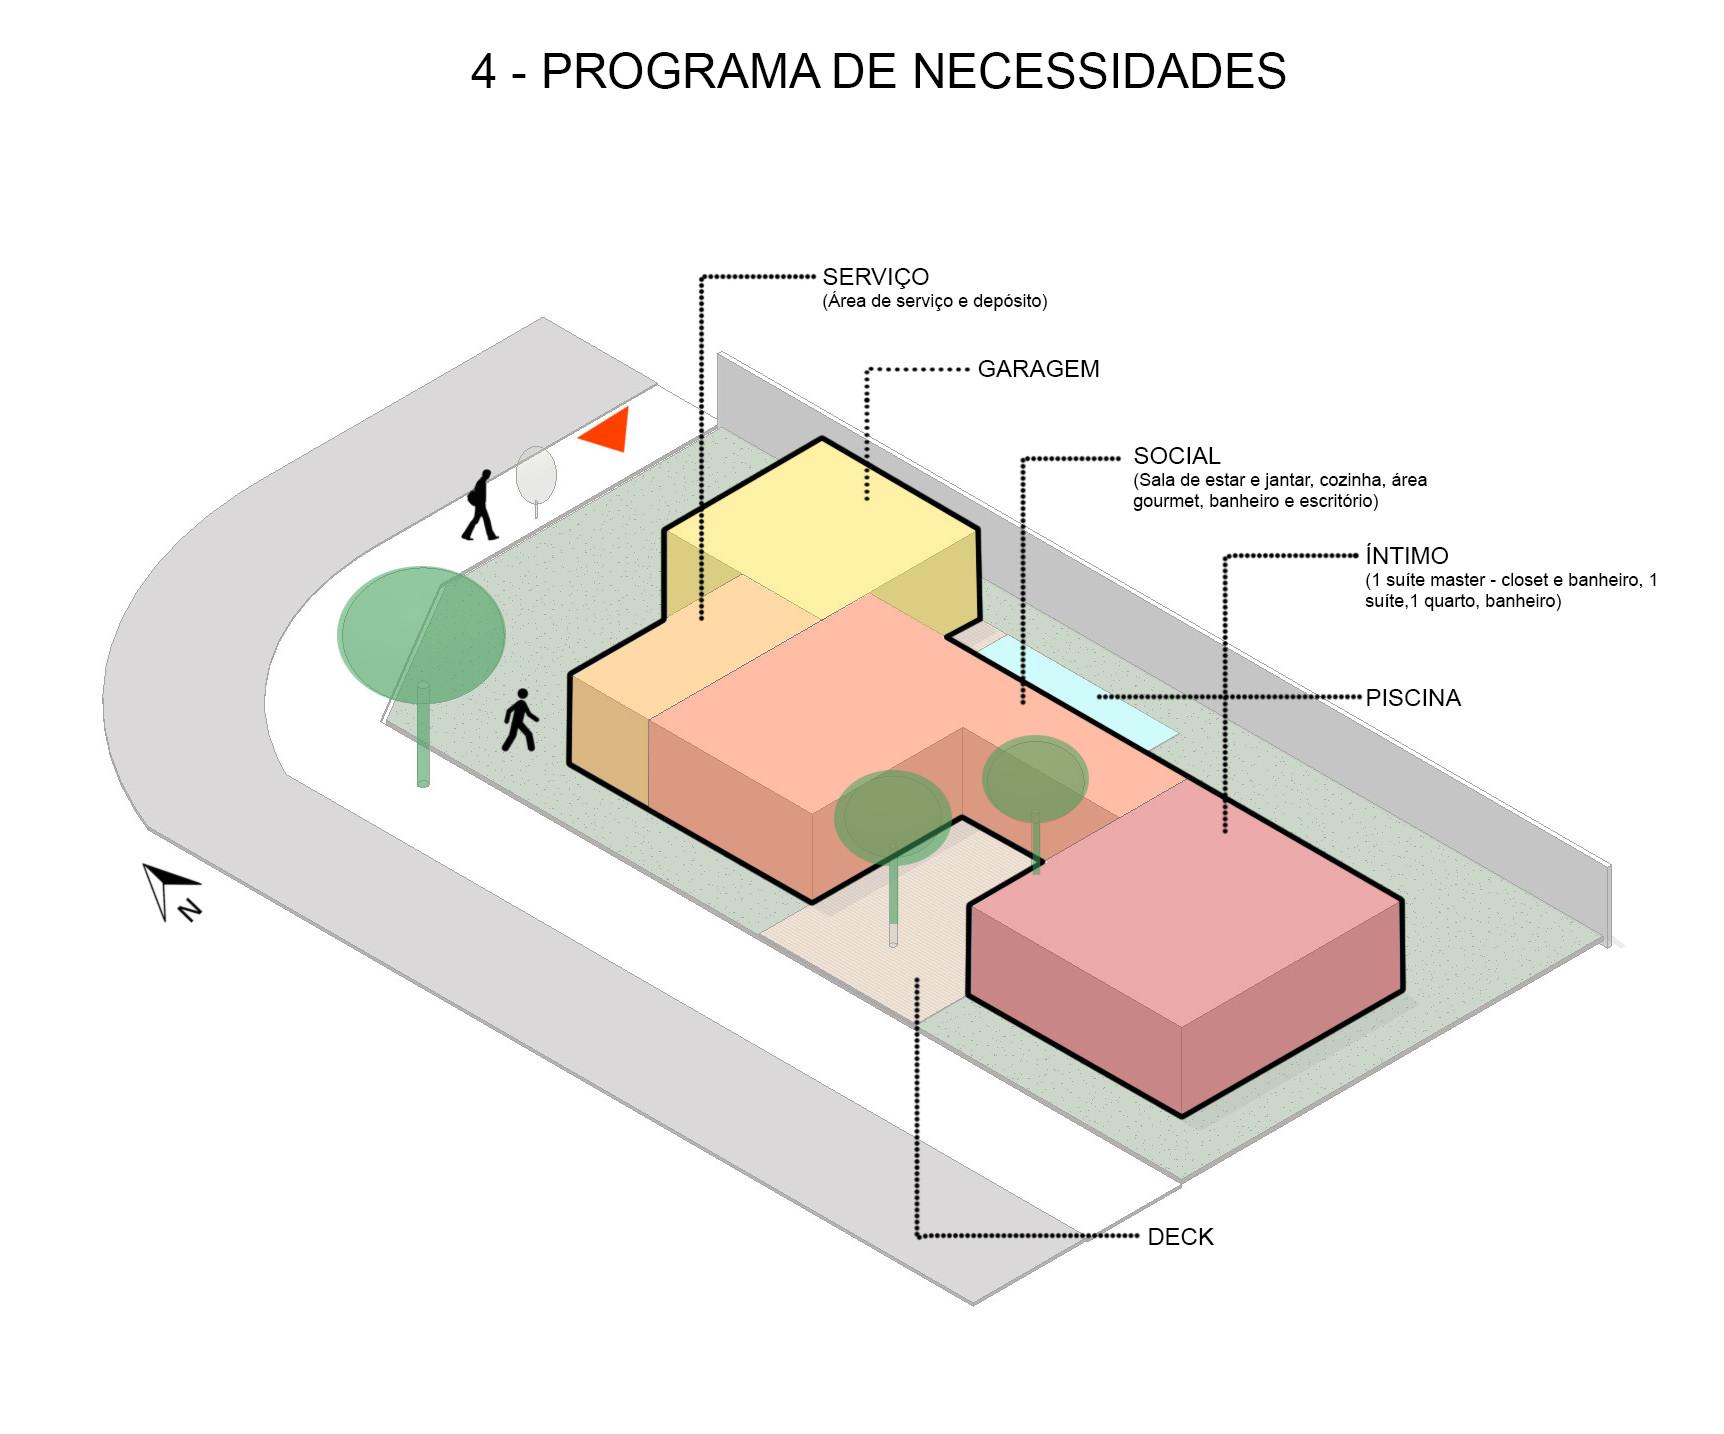 4 - Programa de necessidades